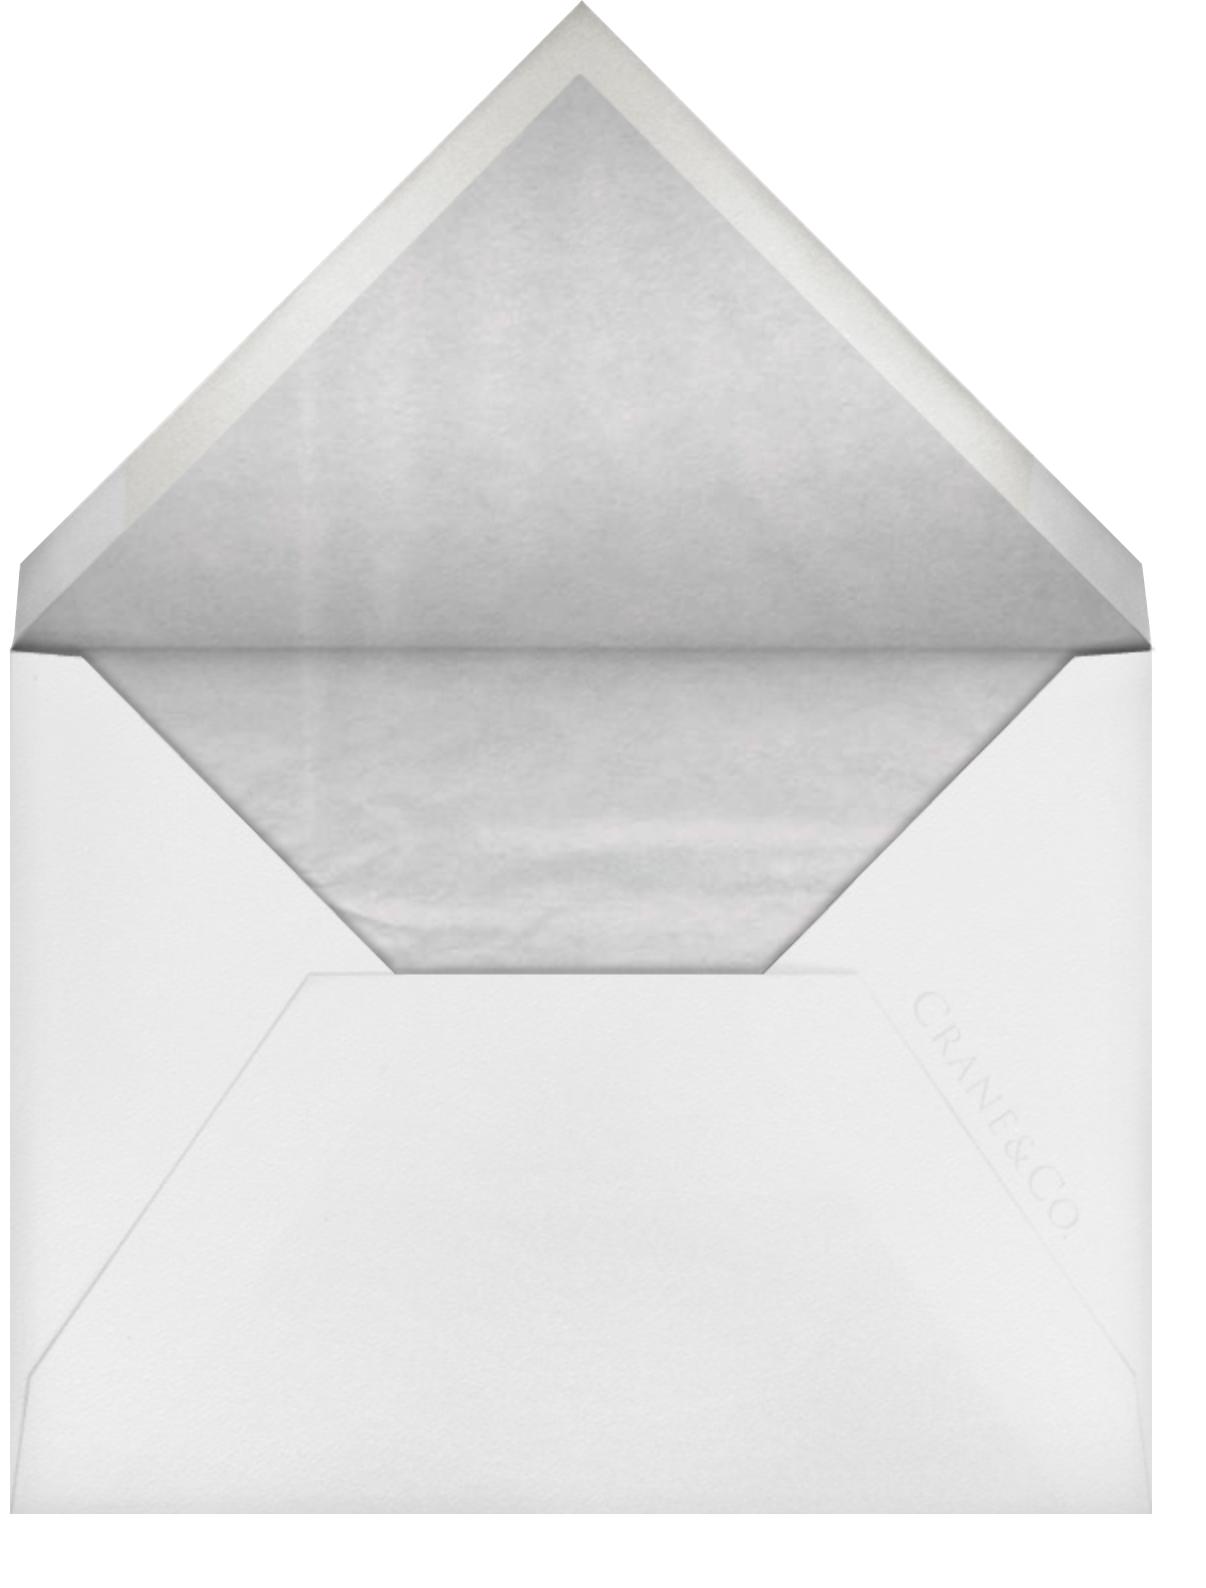 Lamina I (Invitation) - Platinum - Paperless Post - All - envelope back